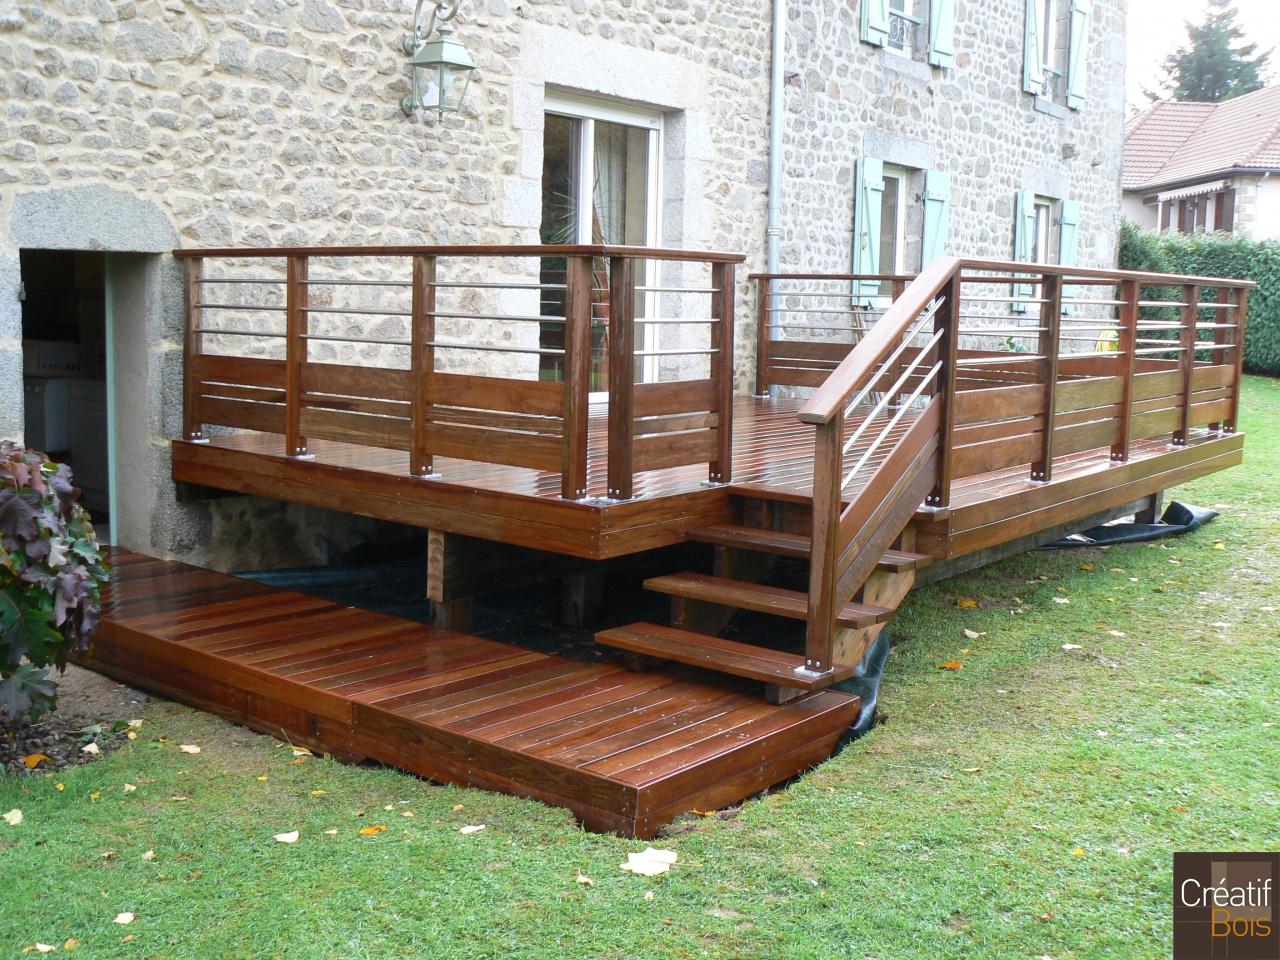 terrasse bois sainte feyre creuse 23 r alisation terrasses cr atif bois galerie cr atif. Black Bedroom Furniture Sets. Home Design Ideas